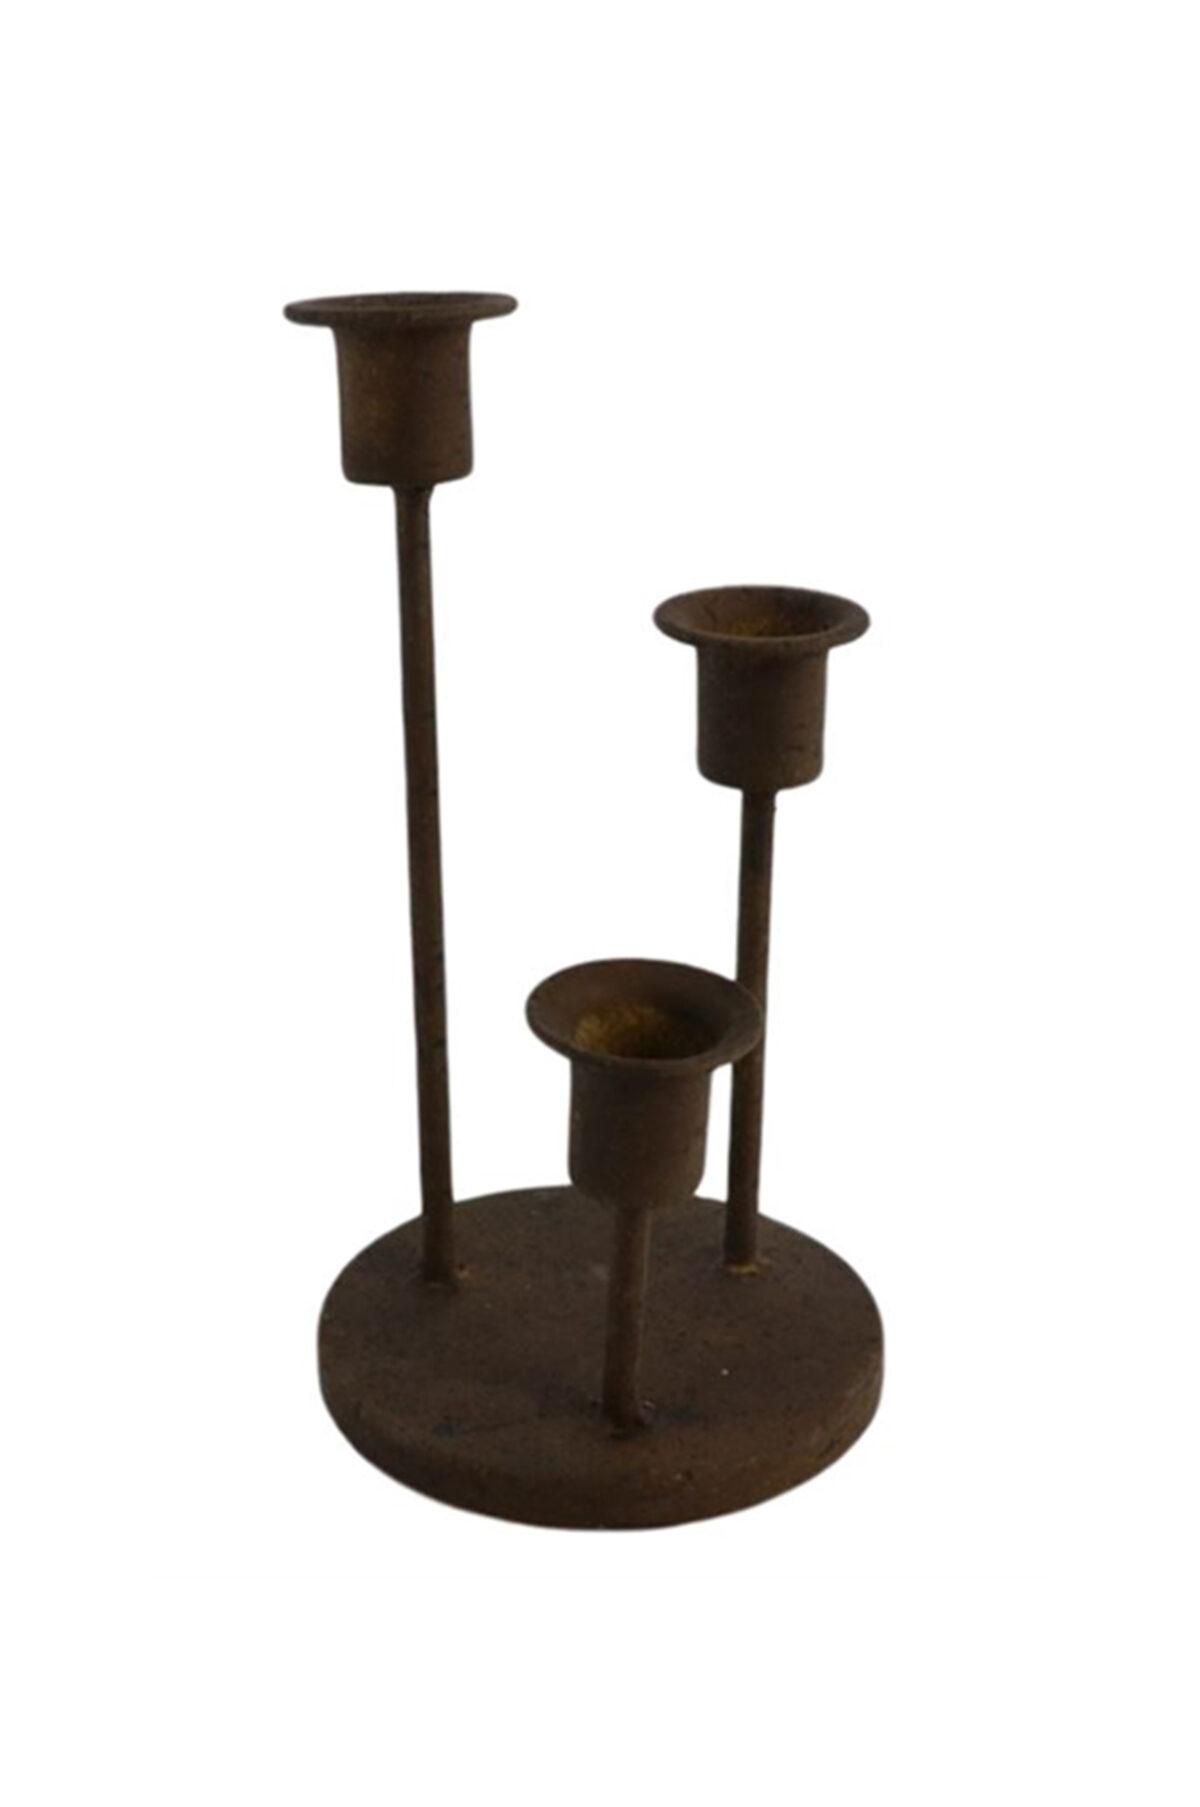 Portacandele a 3 fiamme in ferro effetto Corten d. 10,5 h. 19 cm